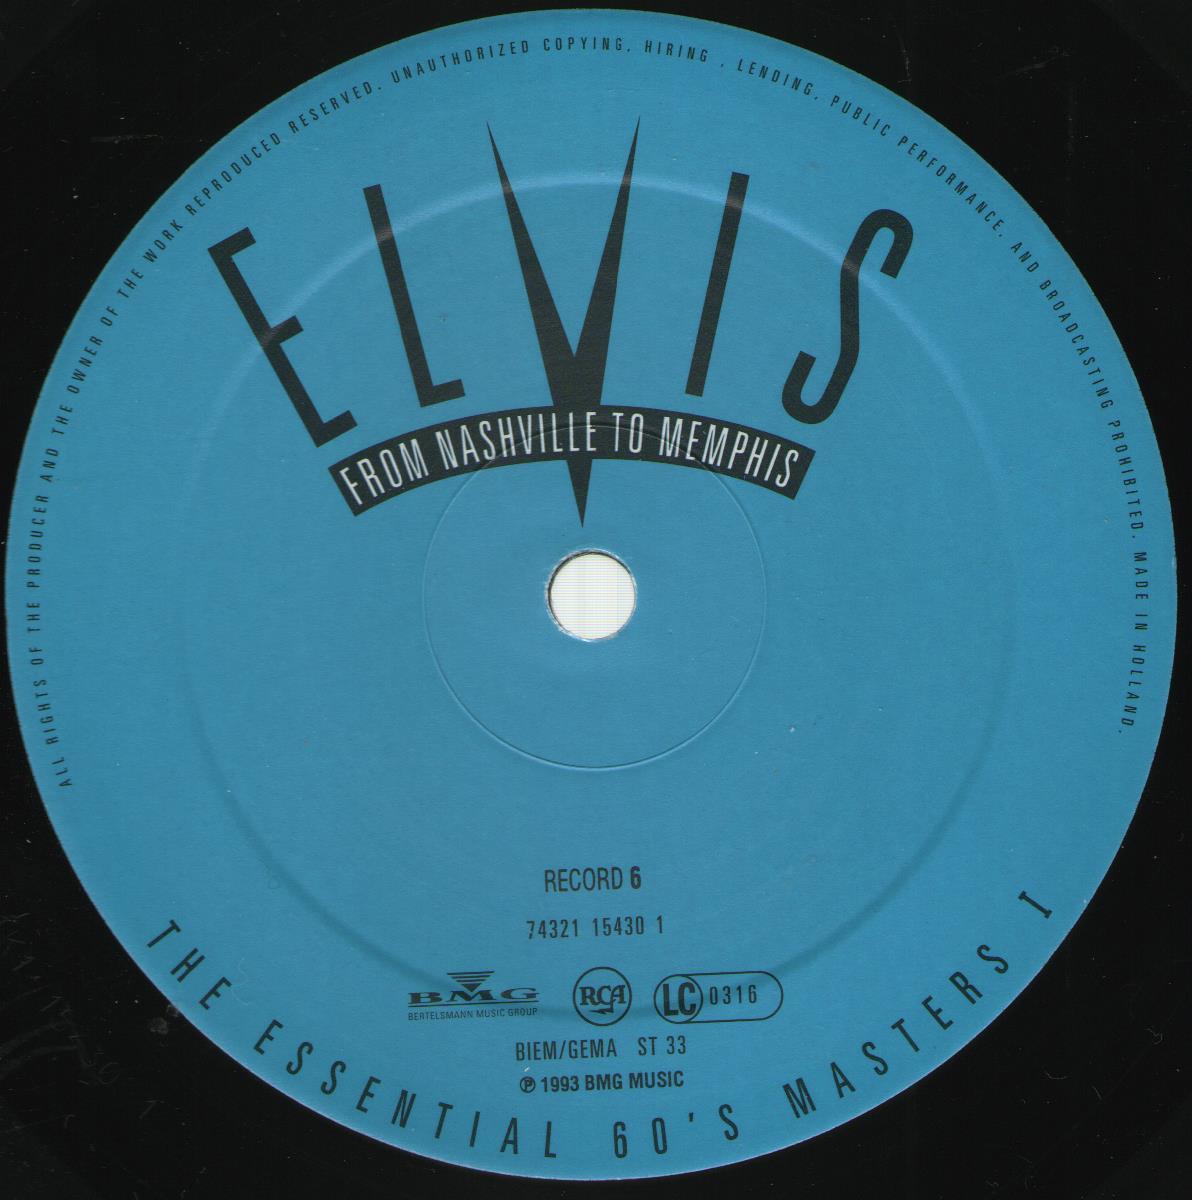 ELVIS - FROM NASHVILLE TO MEMPHIS - THE ESSENTIAL 60'S MASTERS Bild11e1ptk